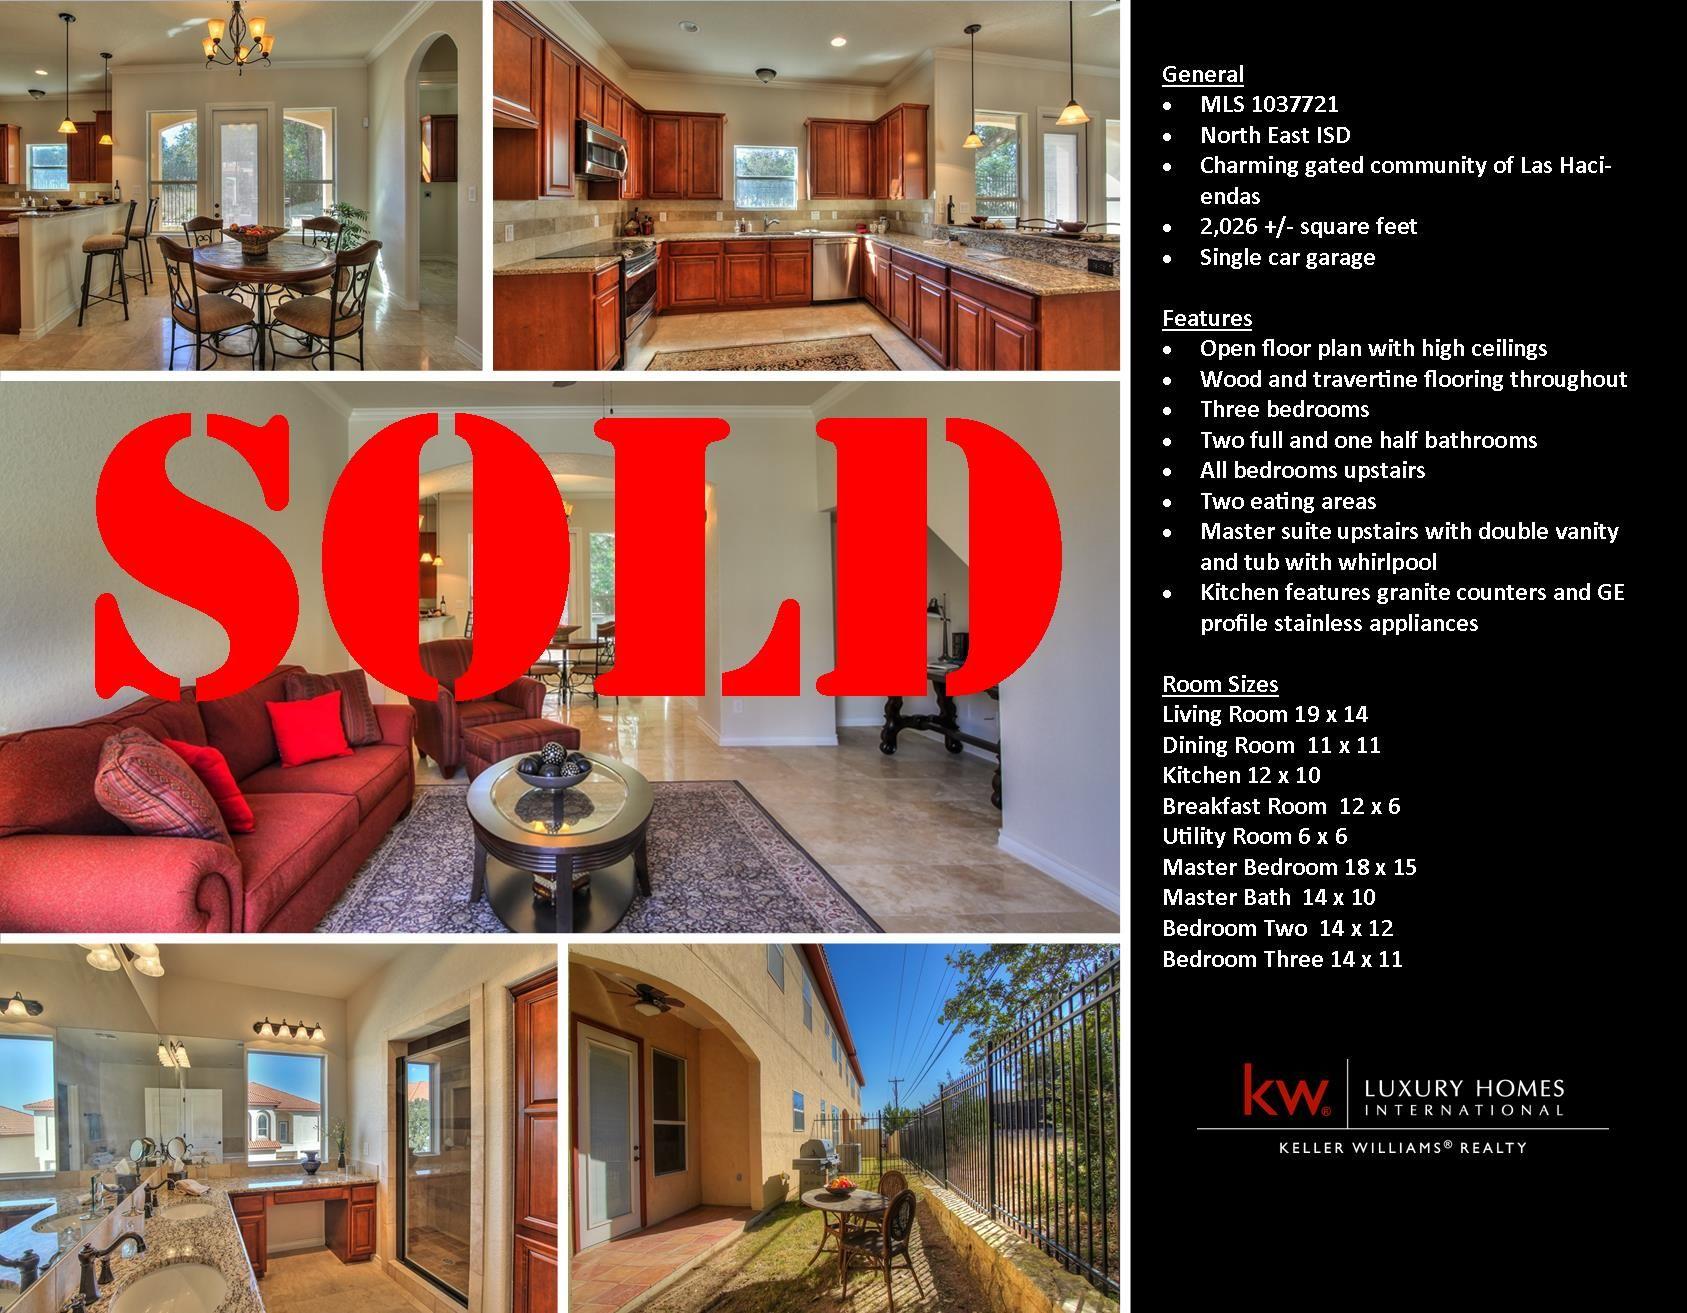 Sold in Las Haciendas of Stone Oak by Trish Najim Real Estate! If